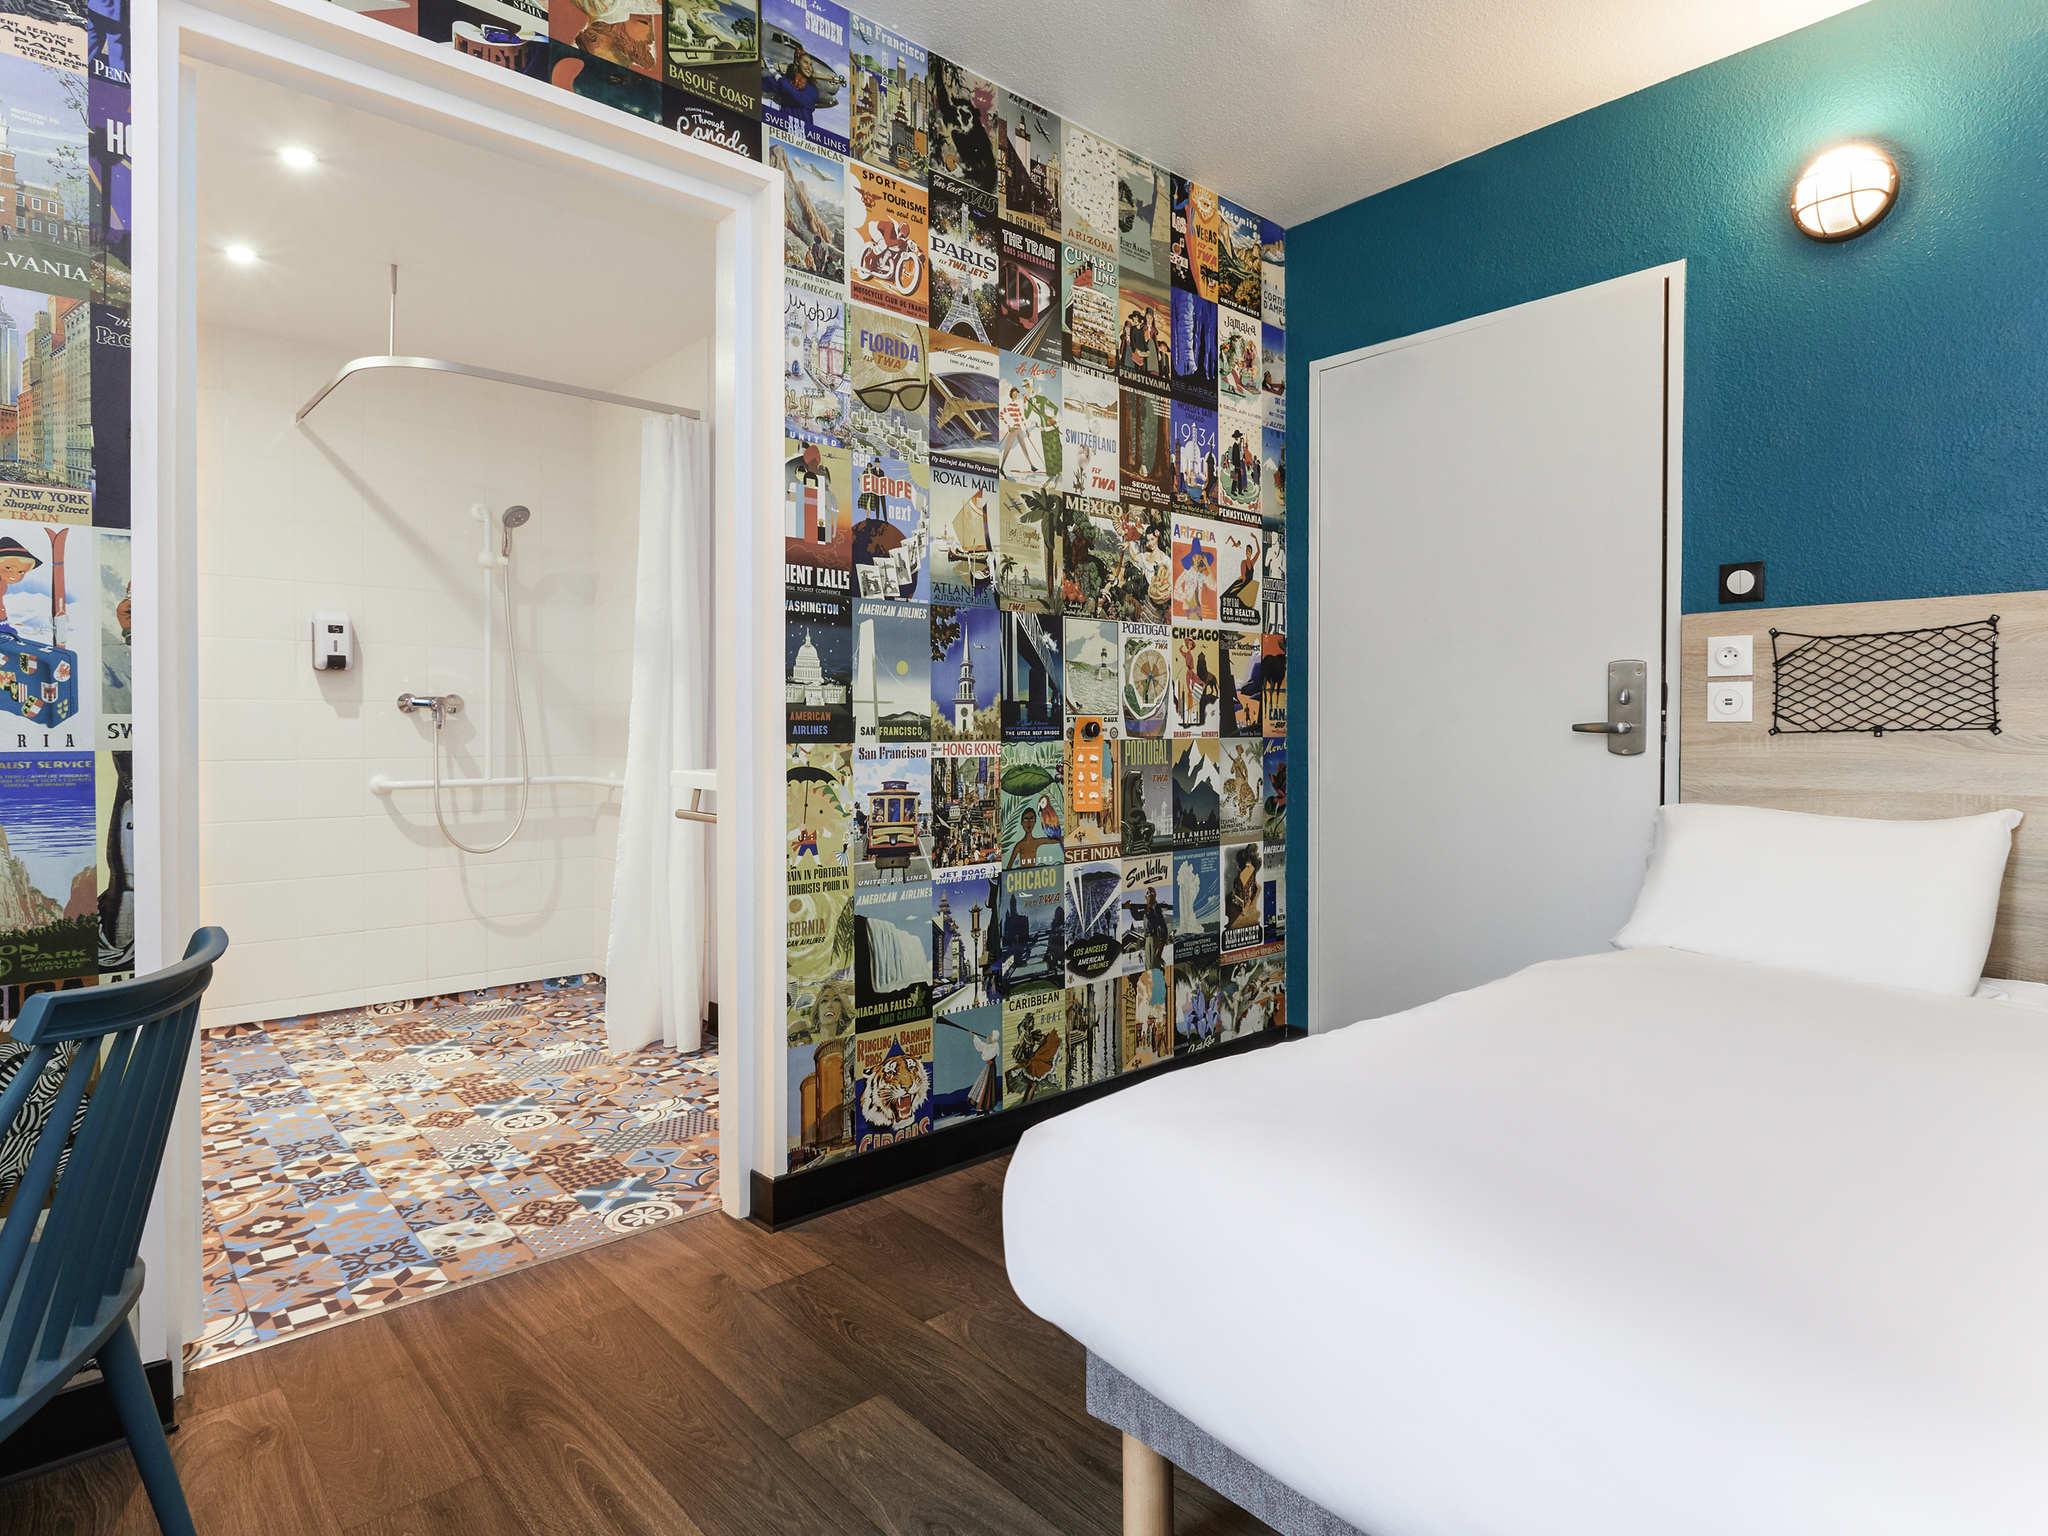 Hôtel - hotelF1 Les Ulis Courtaboeuf